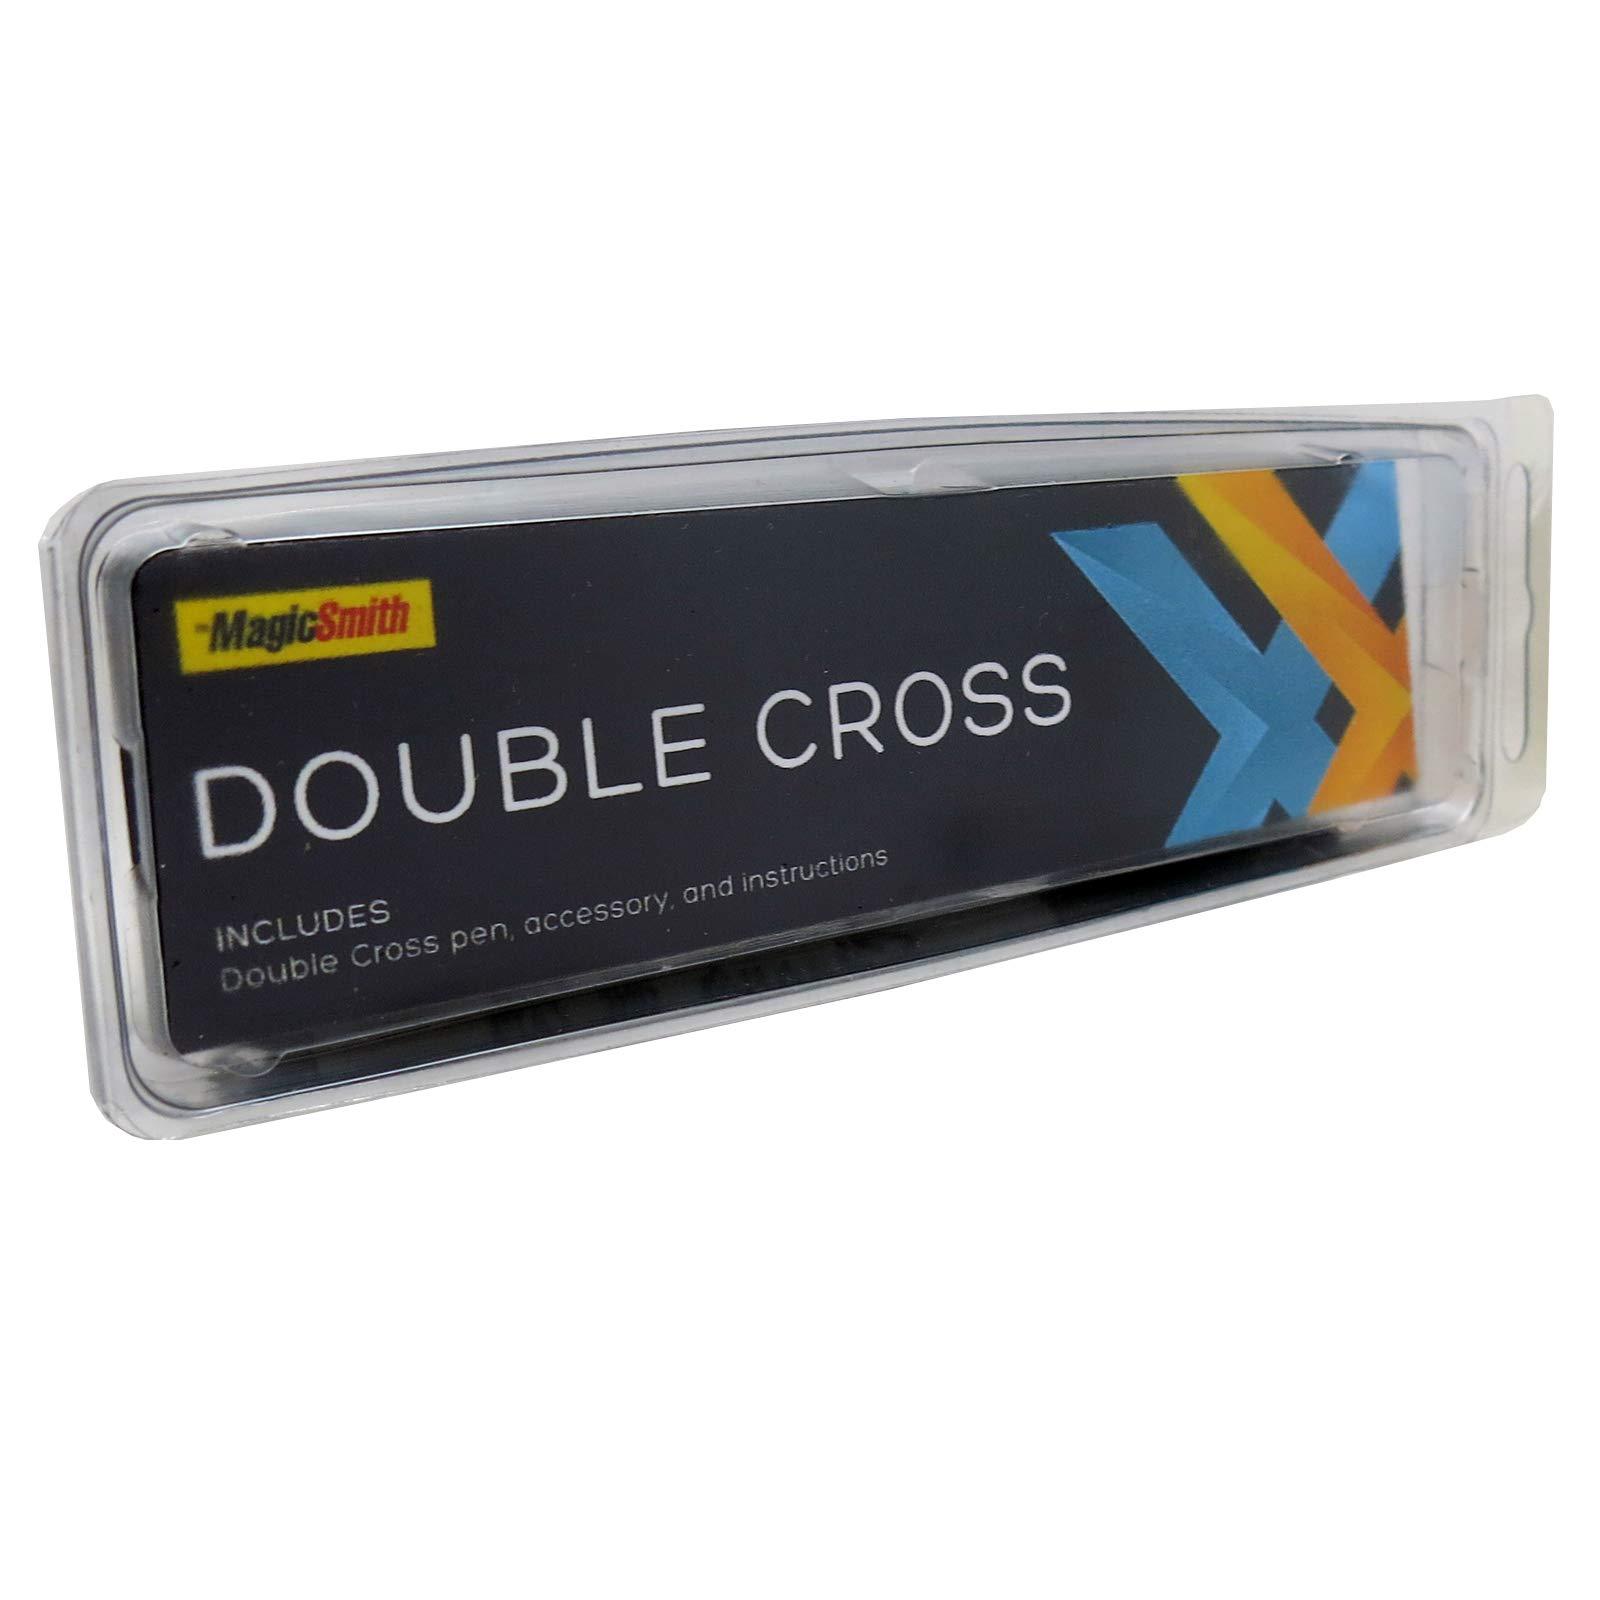 Mark Southworth's Double Cross - Trick by MagicSmith by Magic Smith